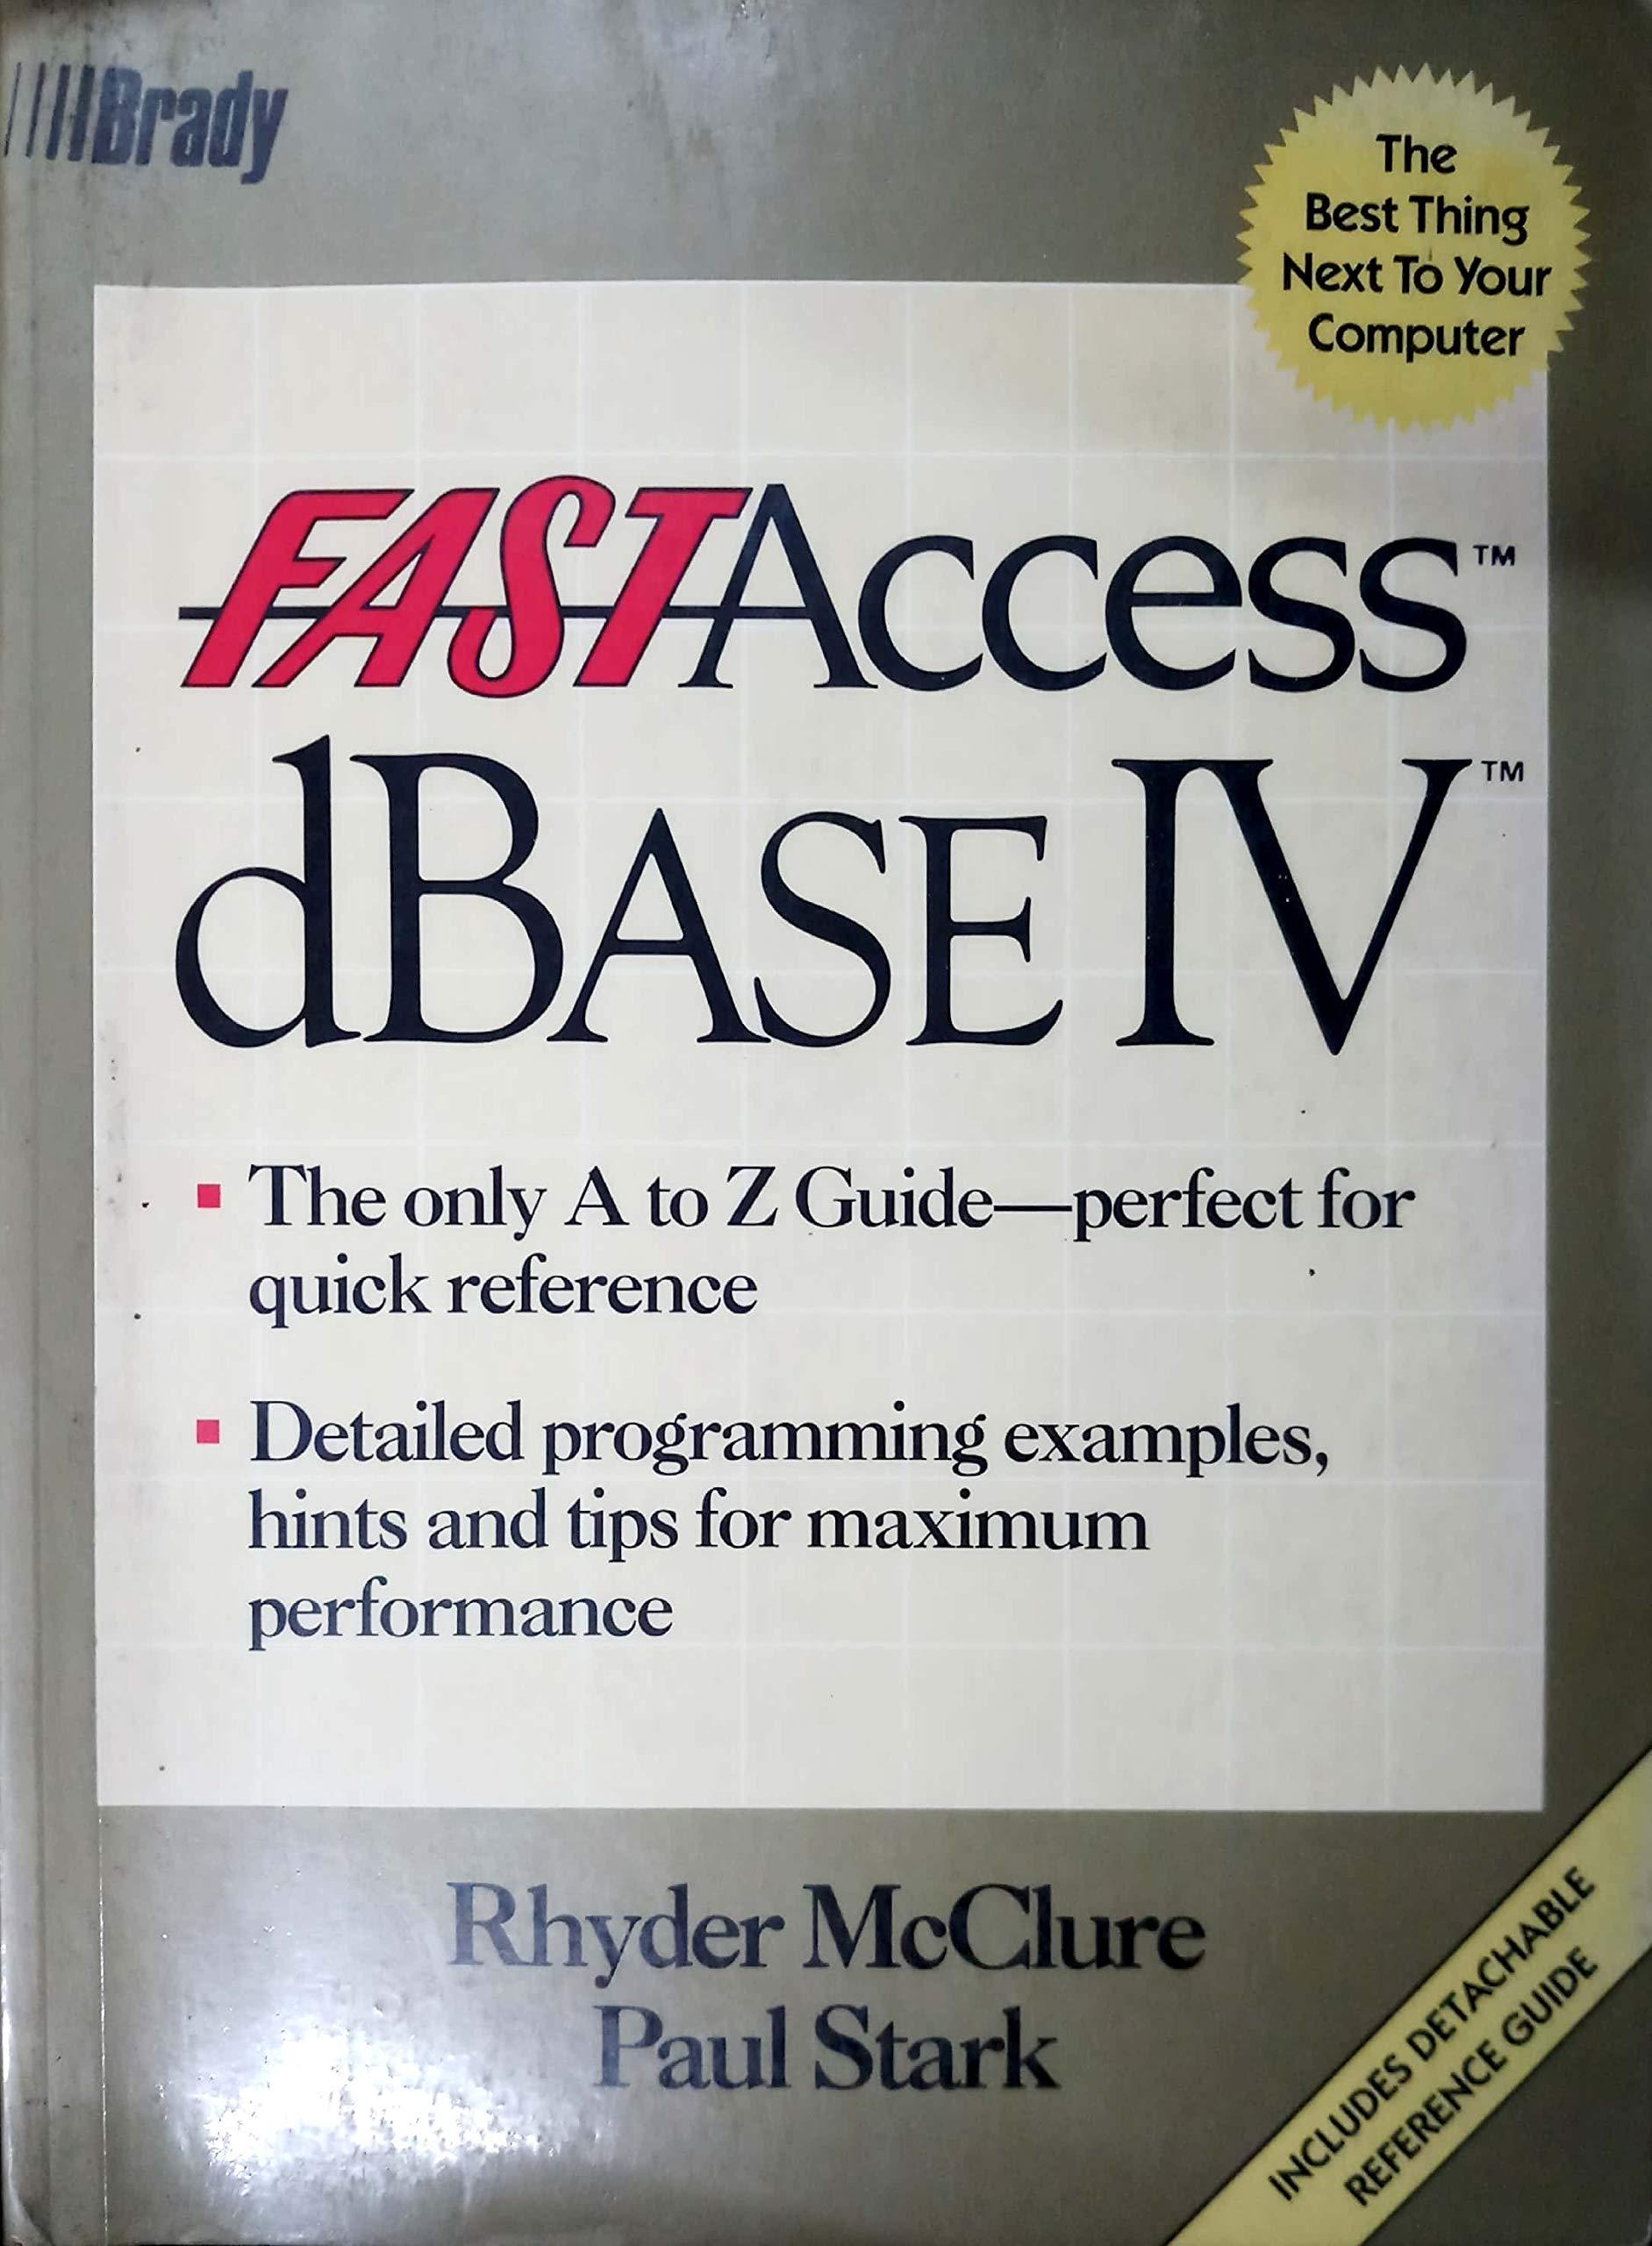 Fast Access/dBASE IV: Rhyder McClure, Paul Stark: 9780133075700